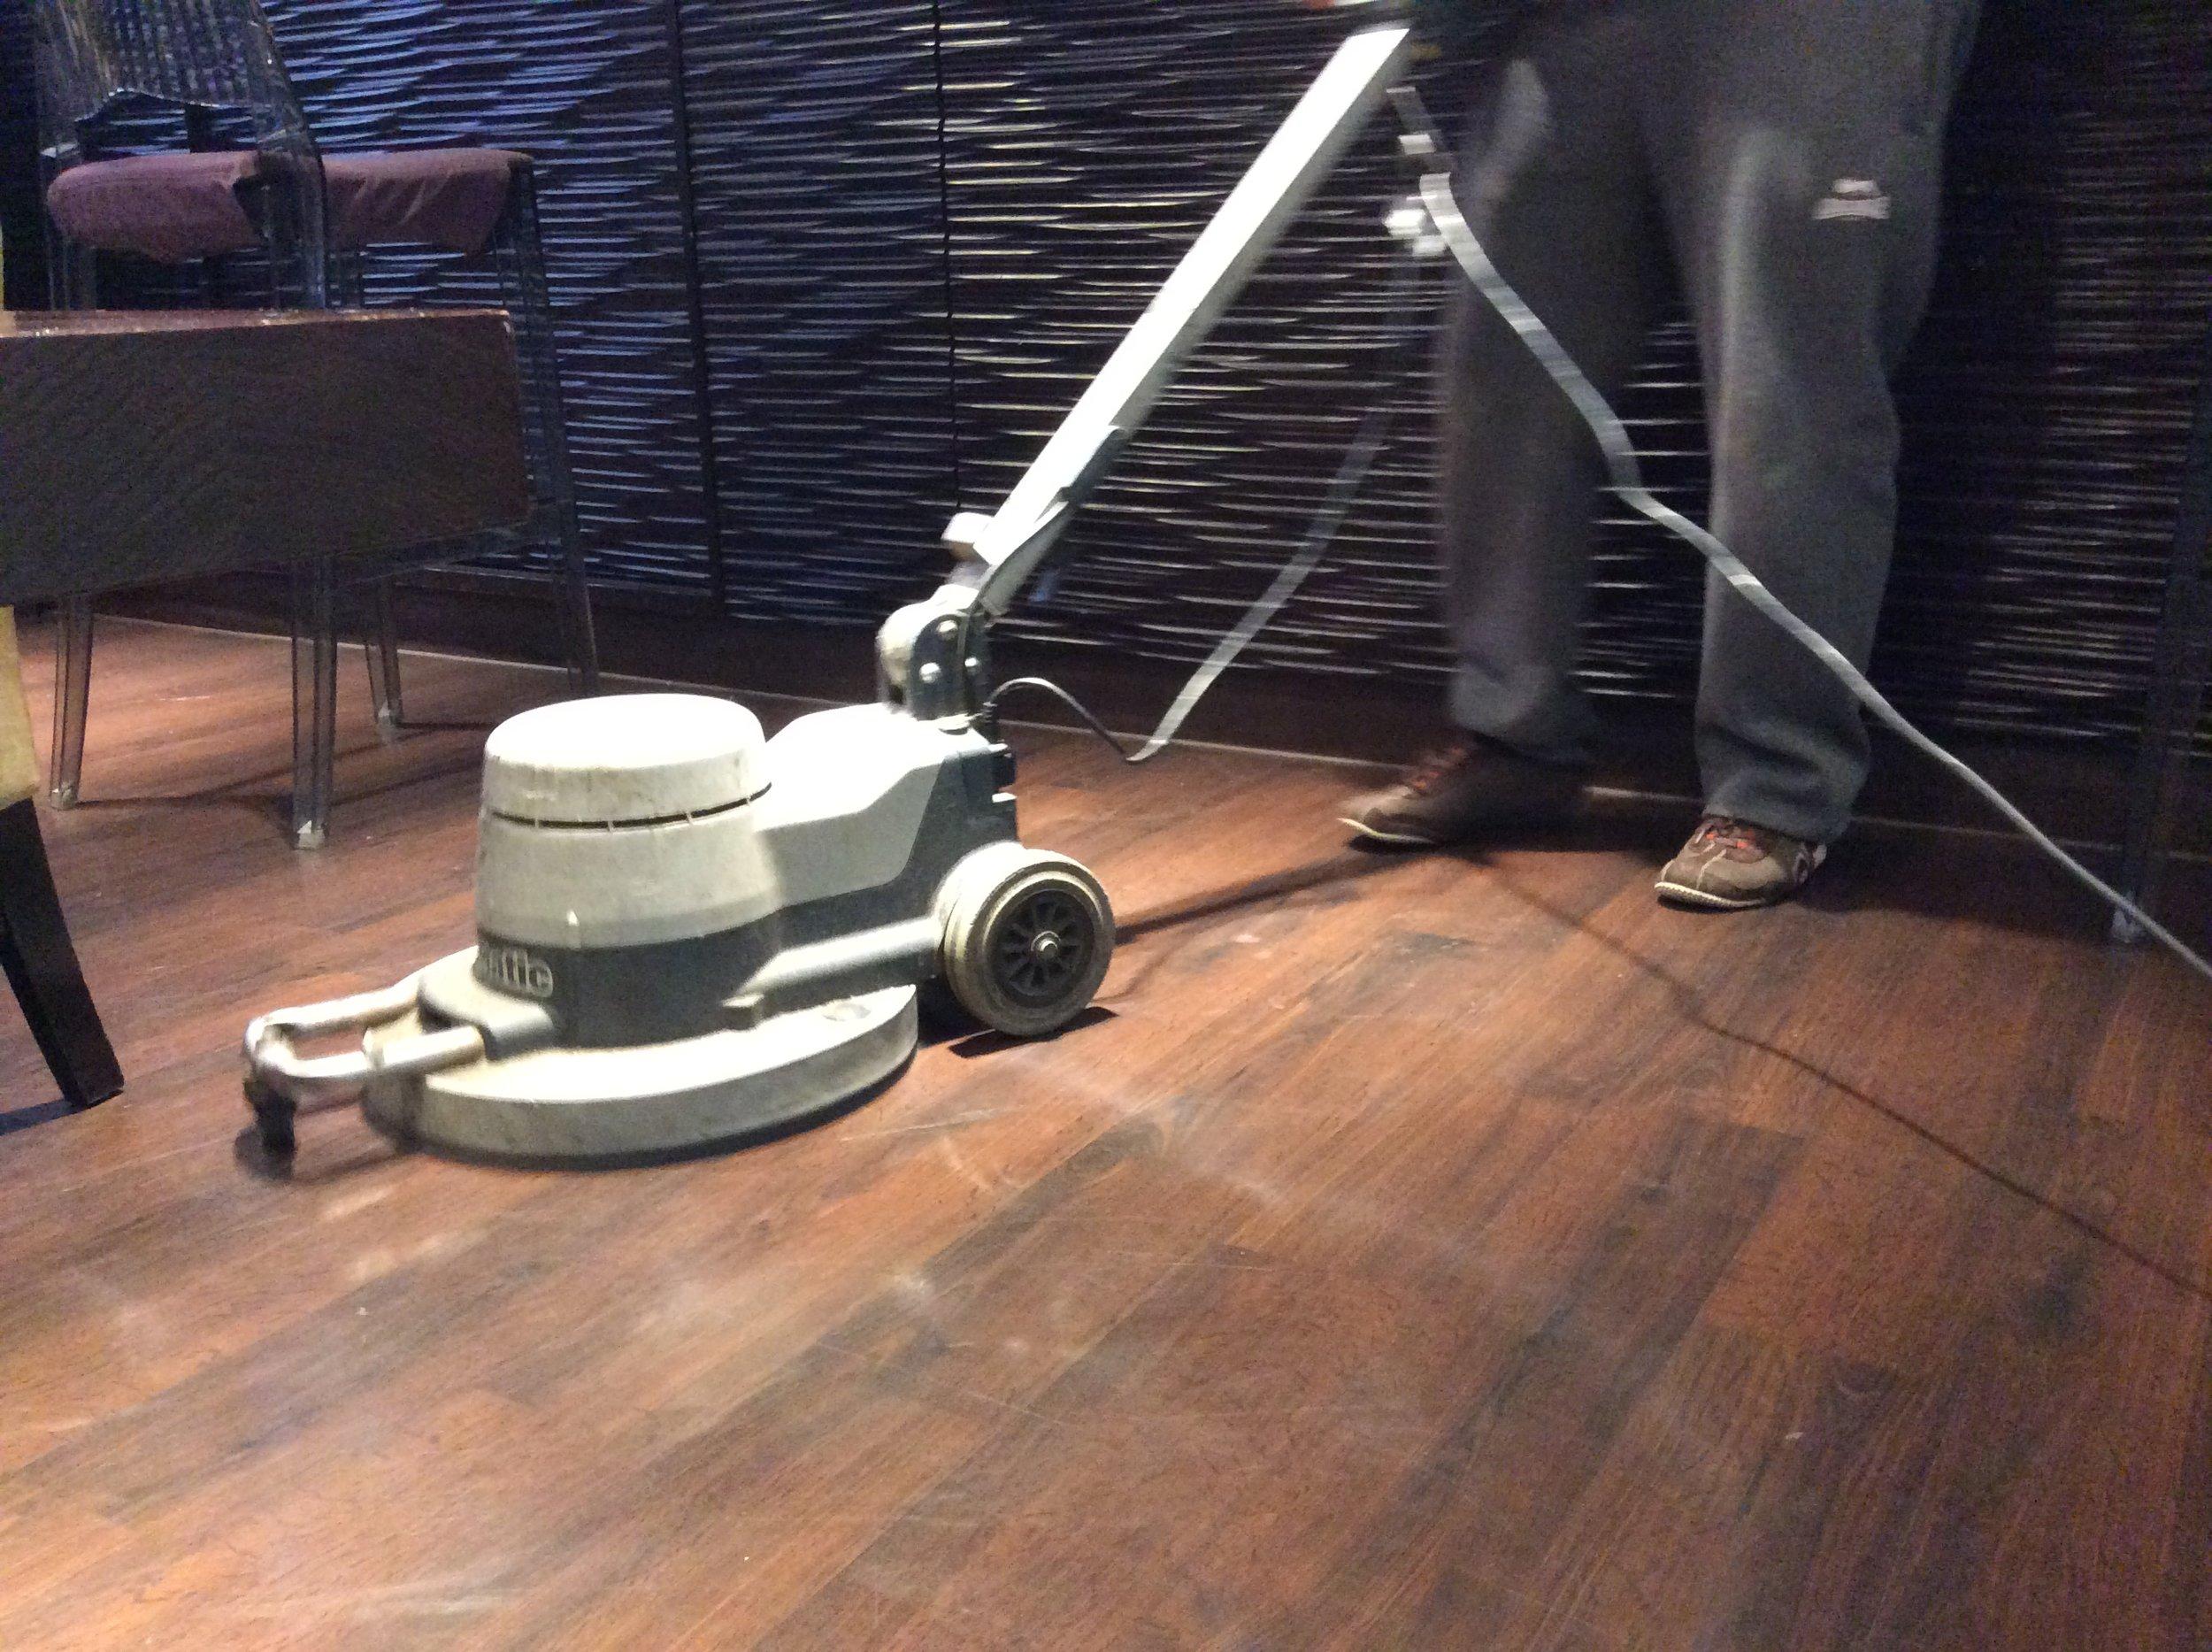 HARD FLOOR CLEANING.    scrubbing                2.50 per/m    scrubbing and polishing   3.50 per/m     scrubbing and sealing     3.50 per/m